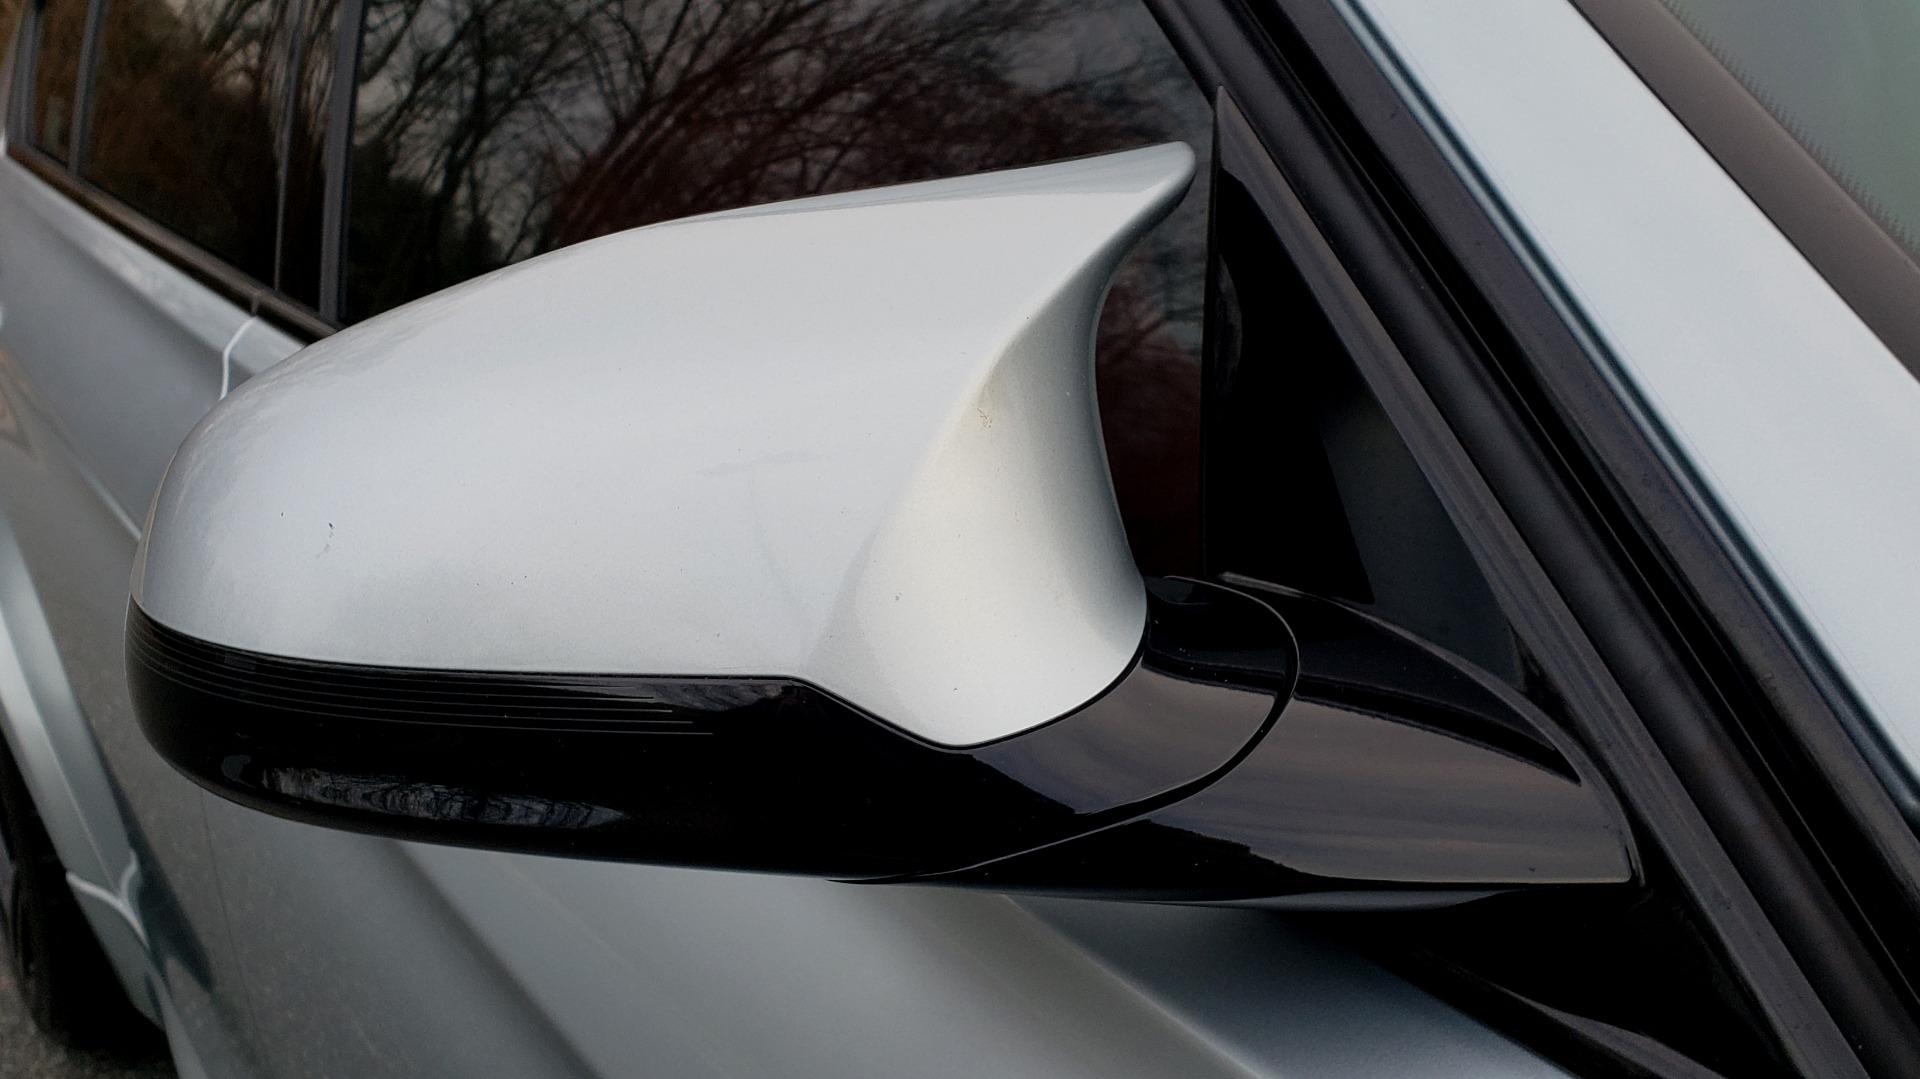 Used 2015 BMW M3 EXECUTIVE PKG / NAV / CAMERA / HUD / CARBON FIBER ROOF for sale Sold at Formula Imports in Charlotte NC 28227 30